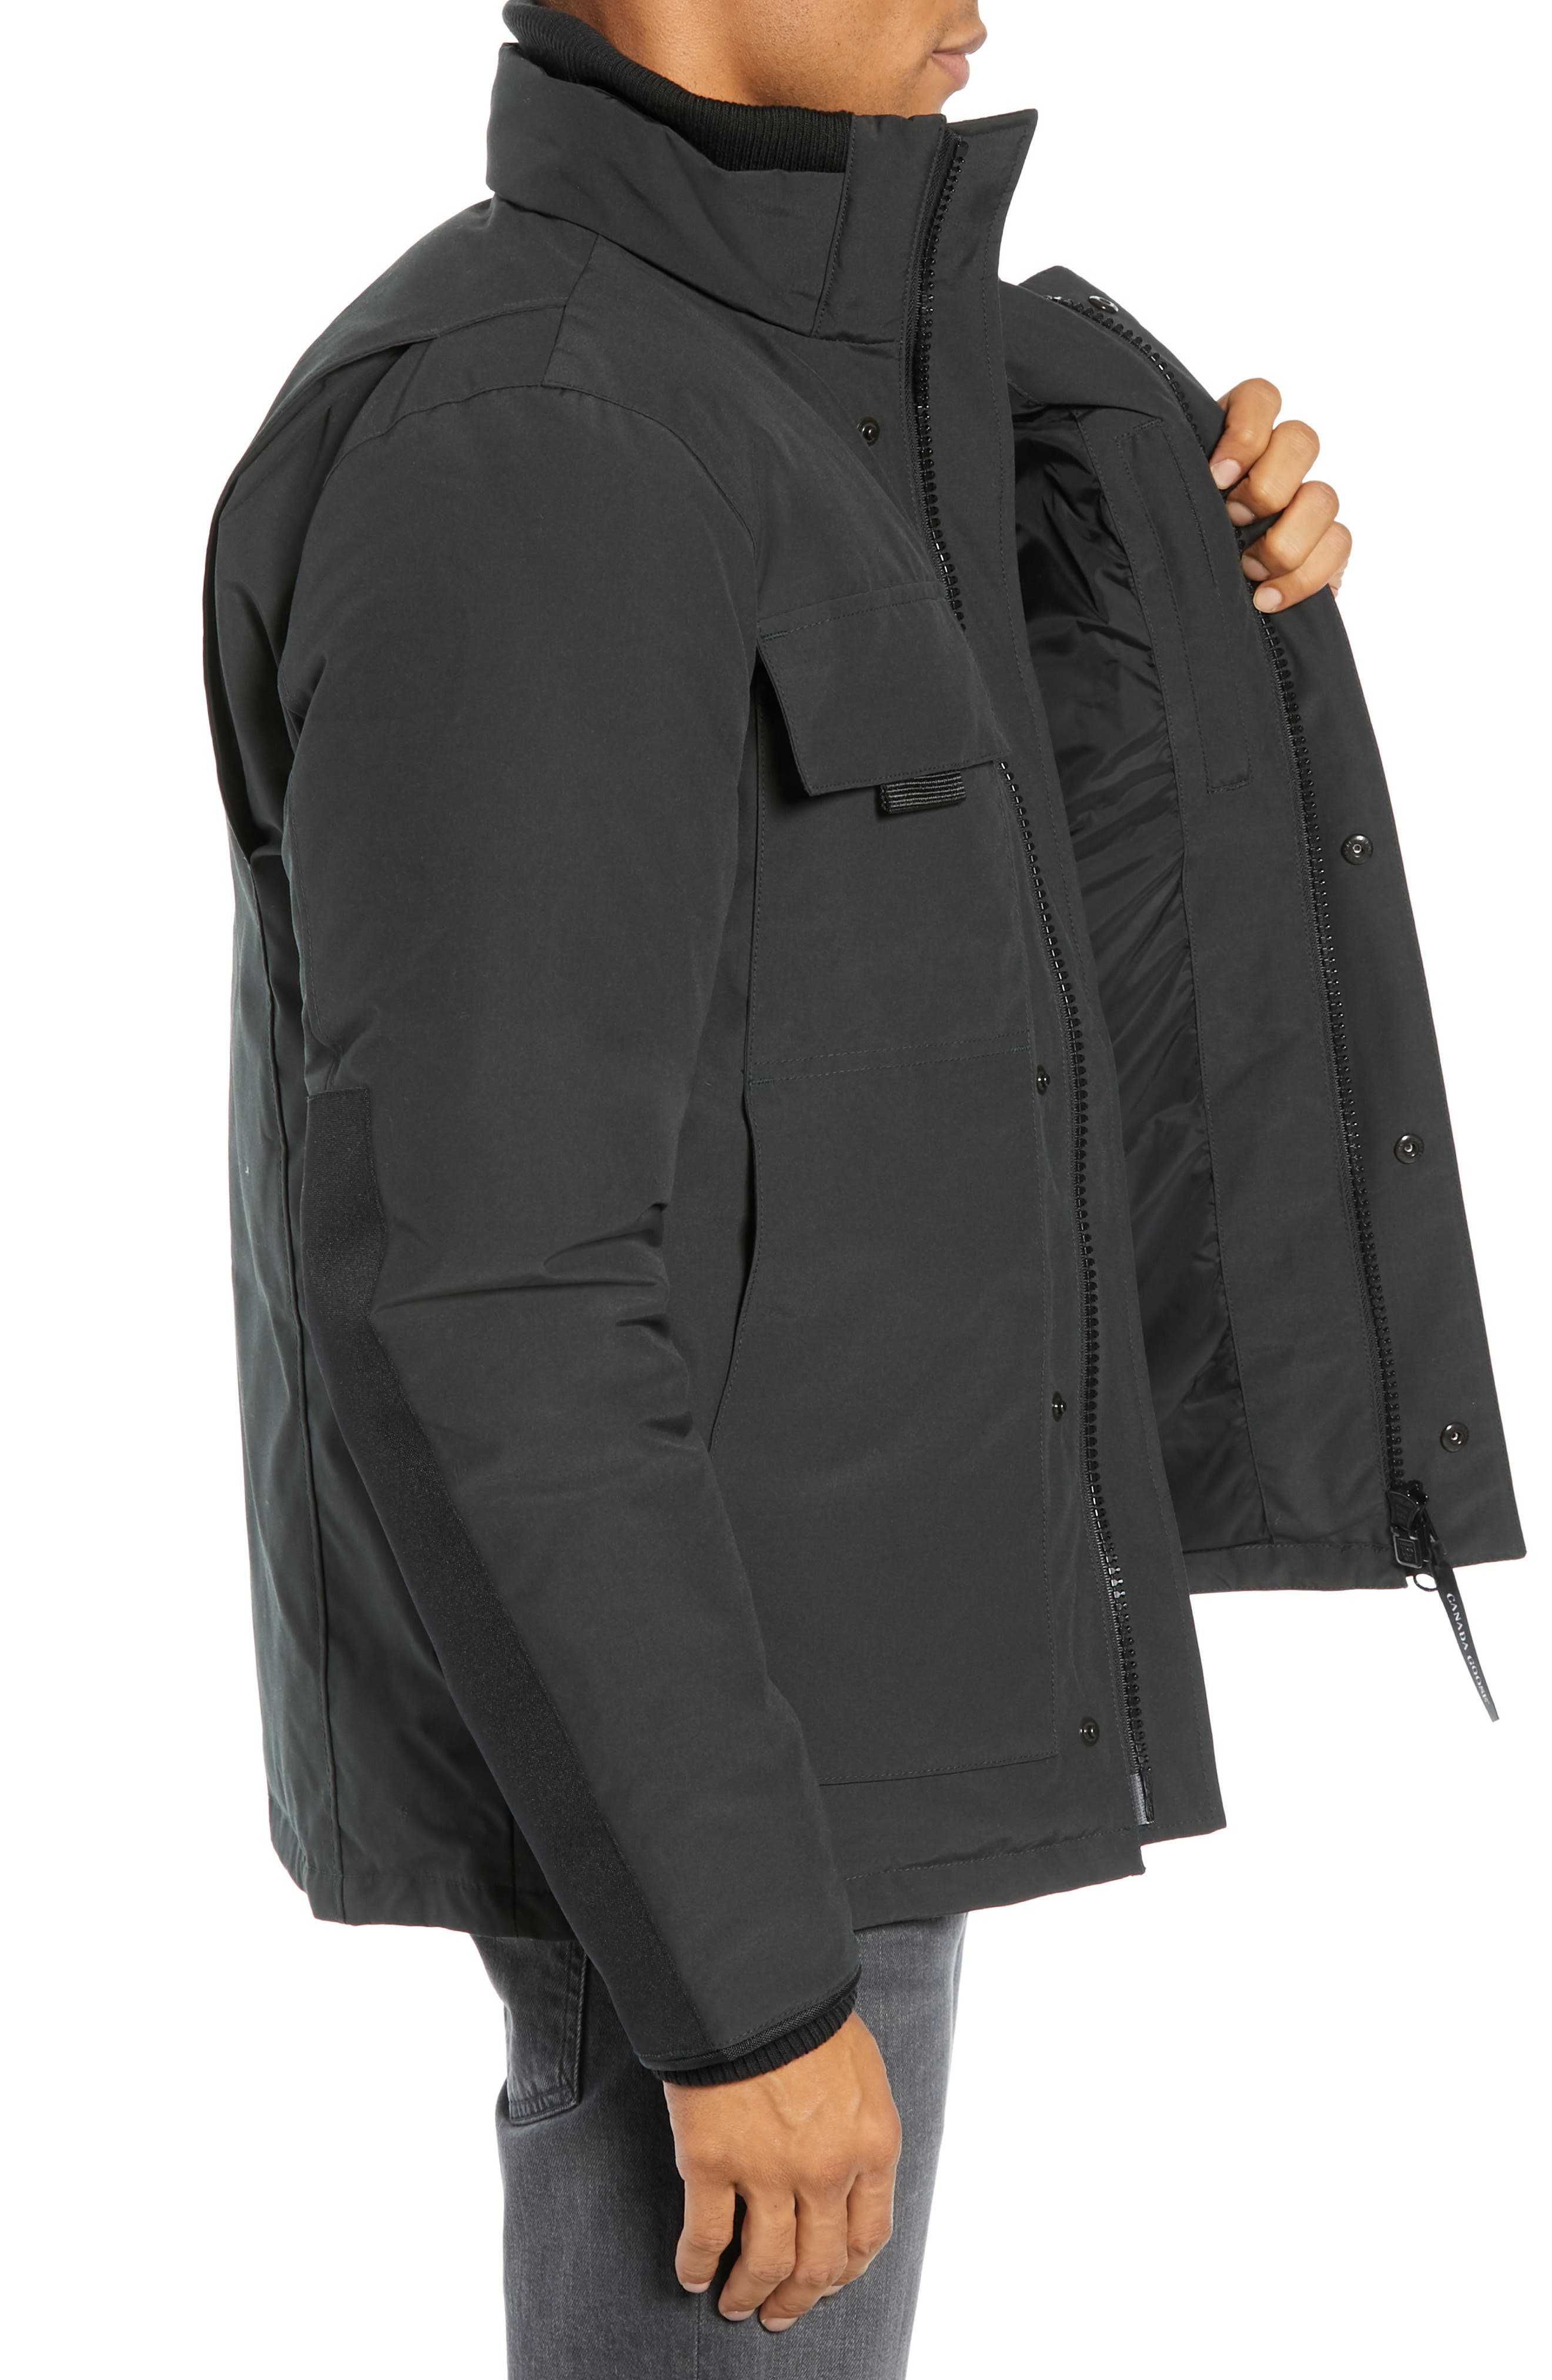 CANADA GOOSE,                             Forester Slim Fit Jacket,                             Alternate thumbnail 3, color,                             BLACK